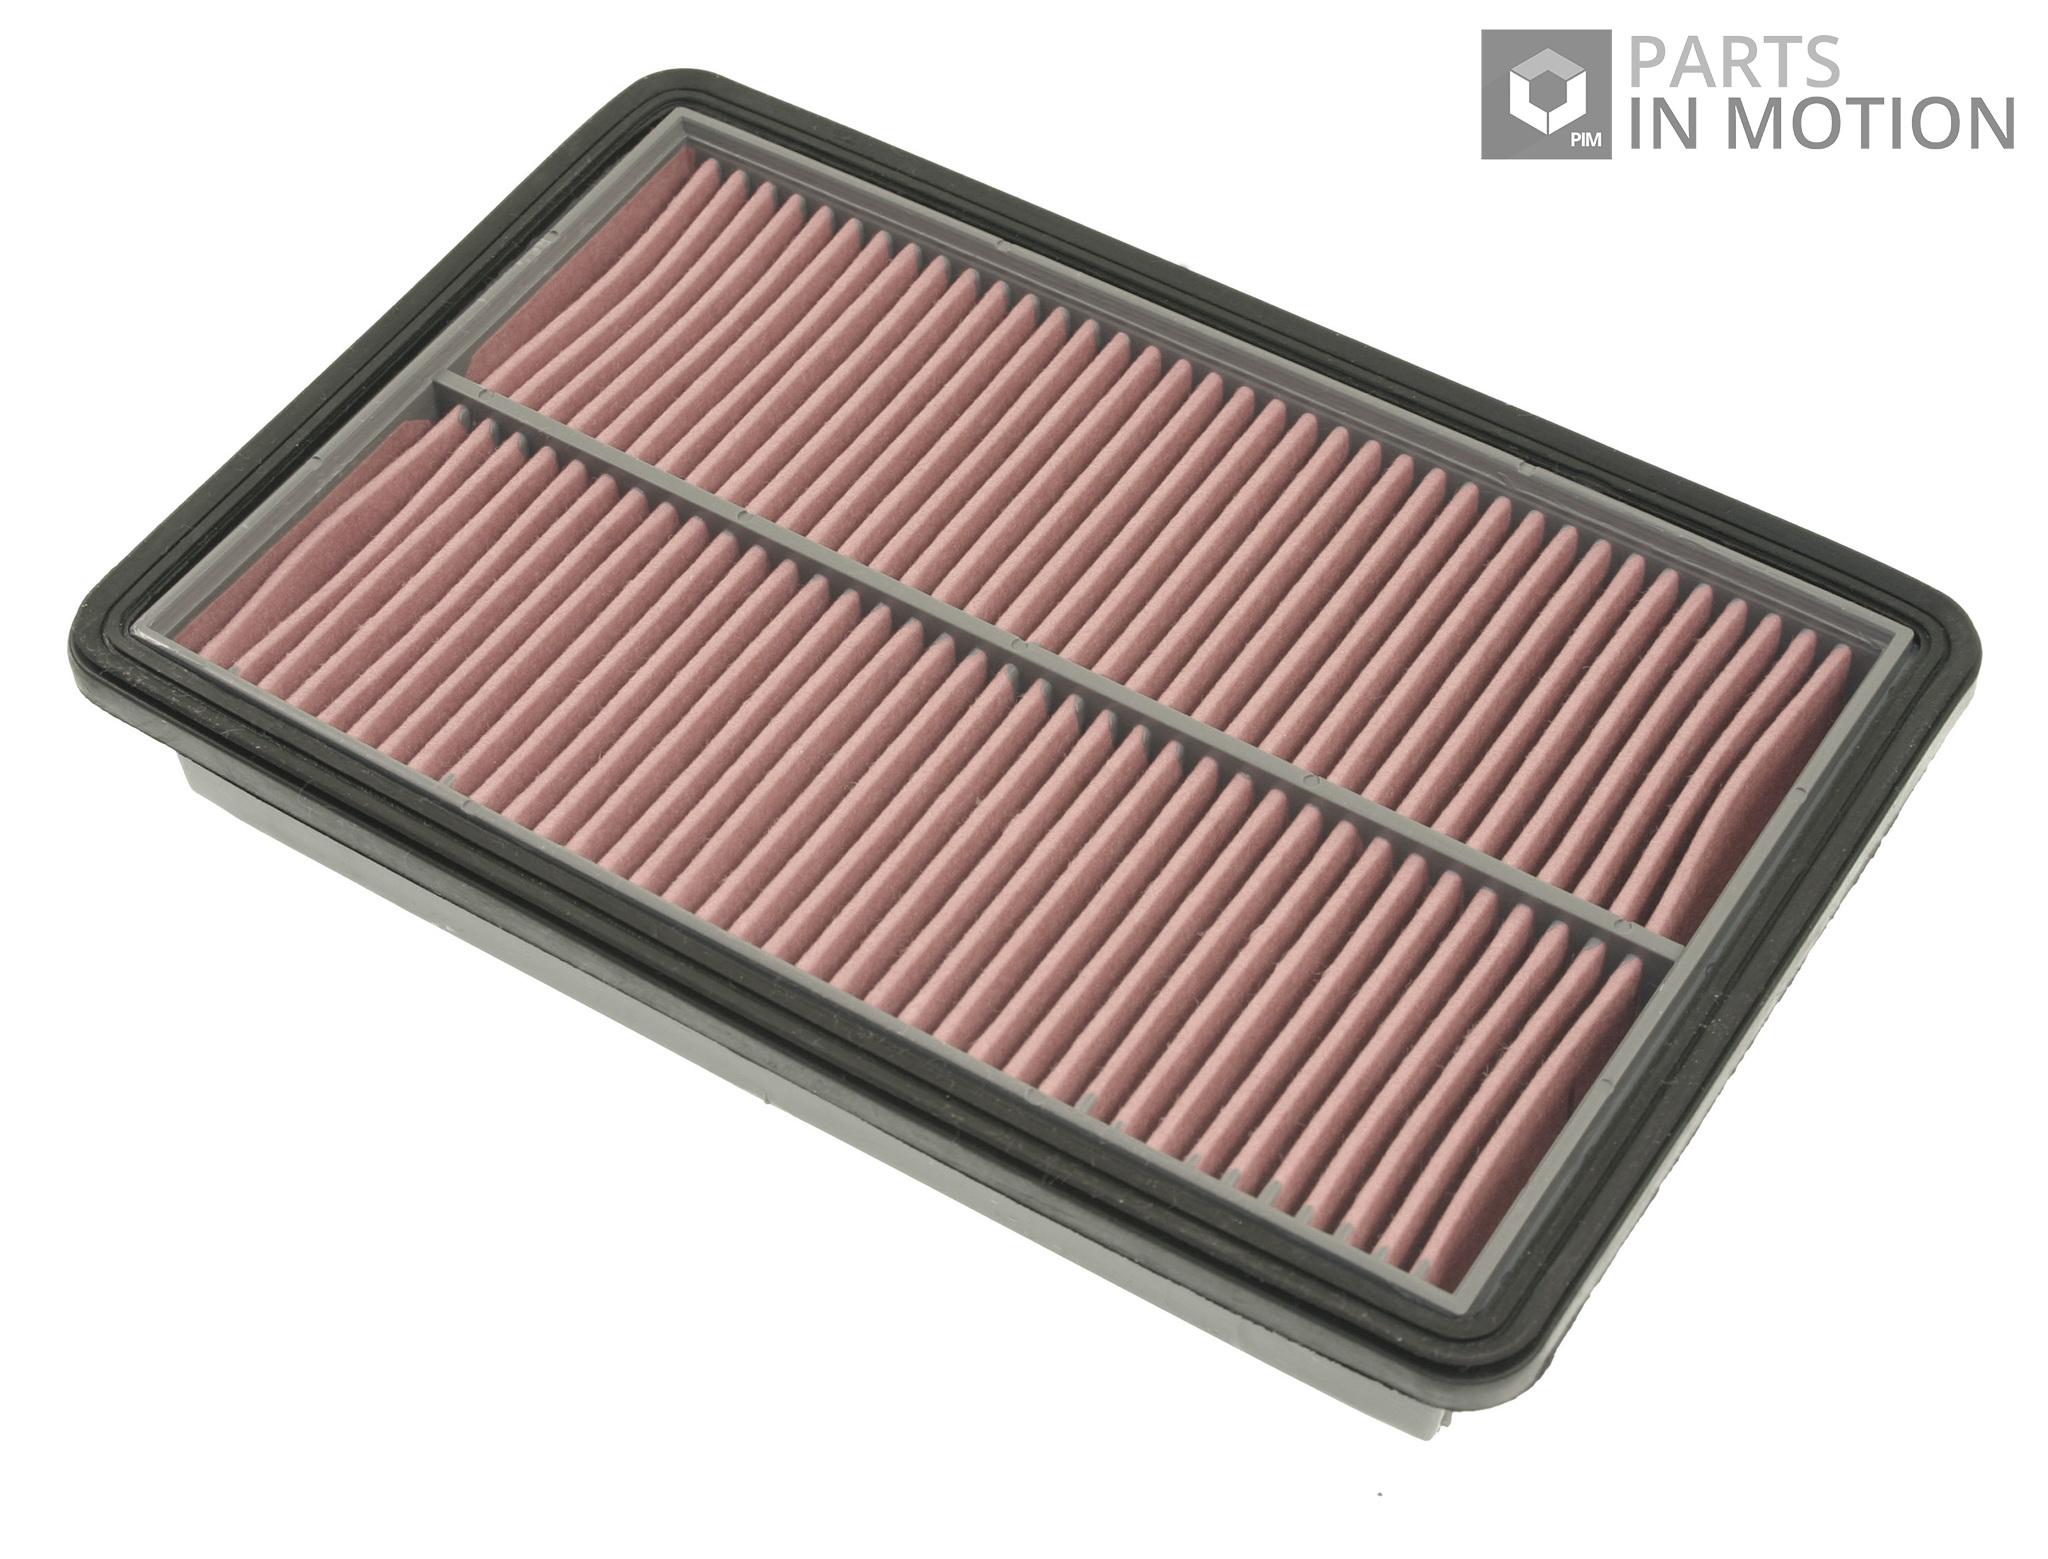 Mazda 323F MK5 1.5 16V Genuine MANN Engine Air Filter Service Replacement